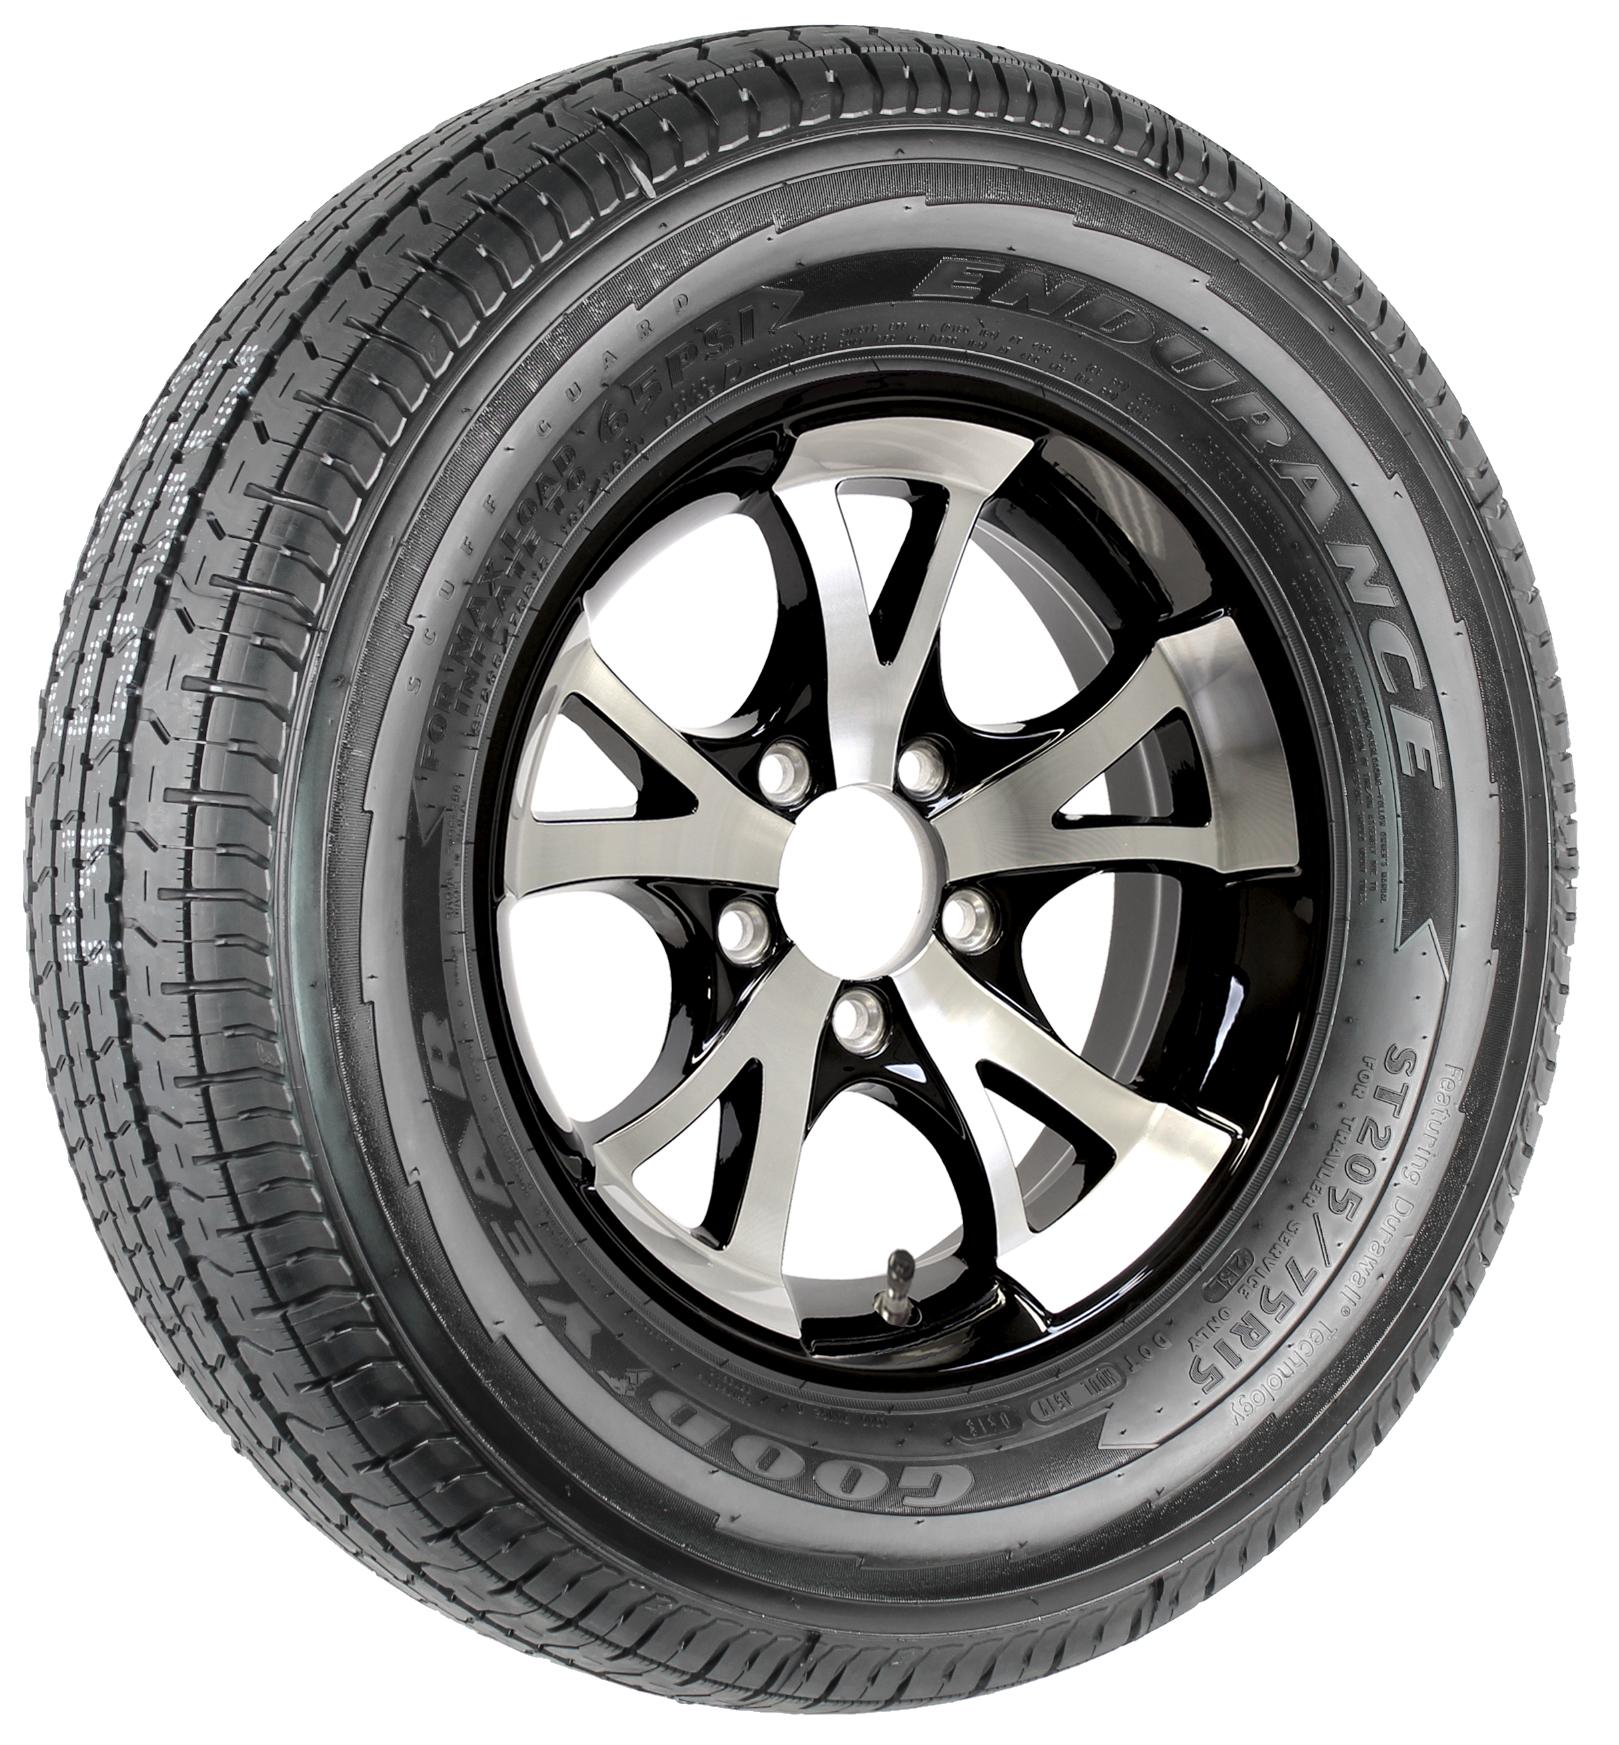 "Goodyear Endurance ST205/75R15 LRD Radial Tire on 15"" 5-Lug A1411 Black Aluminum Assembly Image"